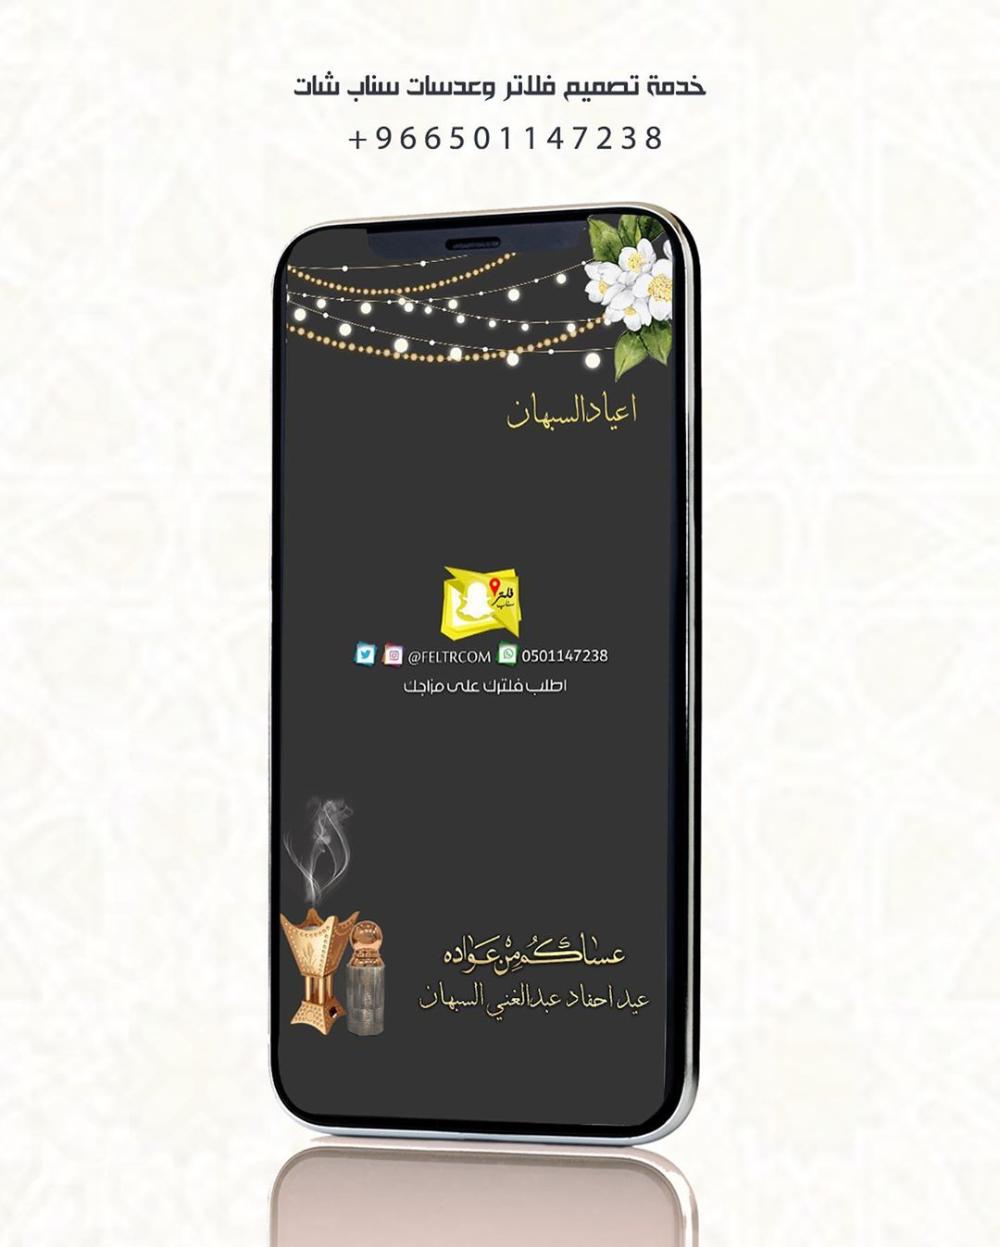 فلاتر و عدسات سناب Feltrcom Instagram Photos And Videos Samsung Galaxy Phone Whatsapp Message Phone